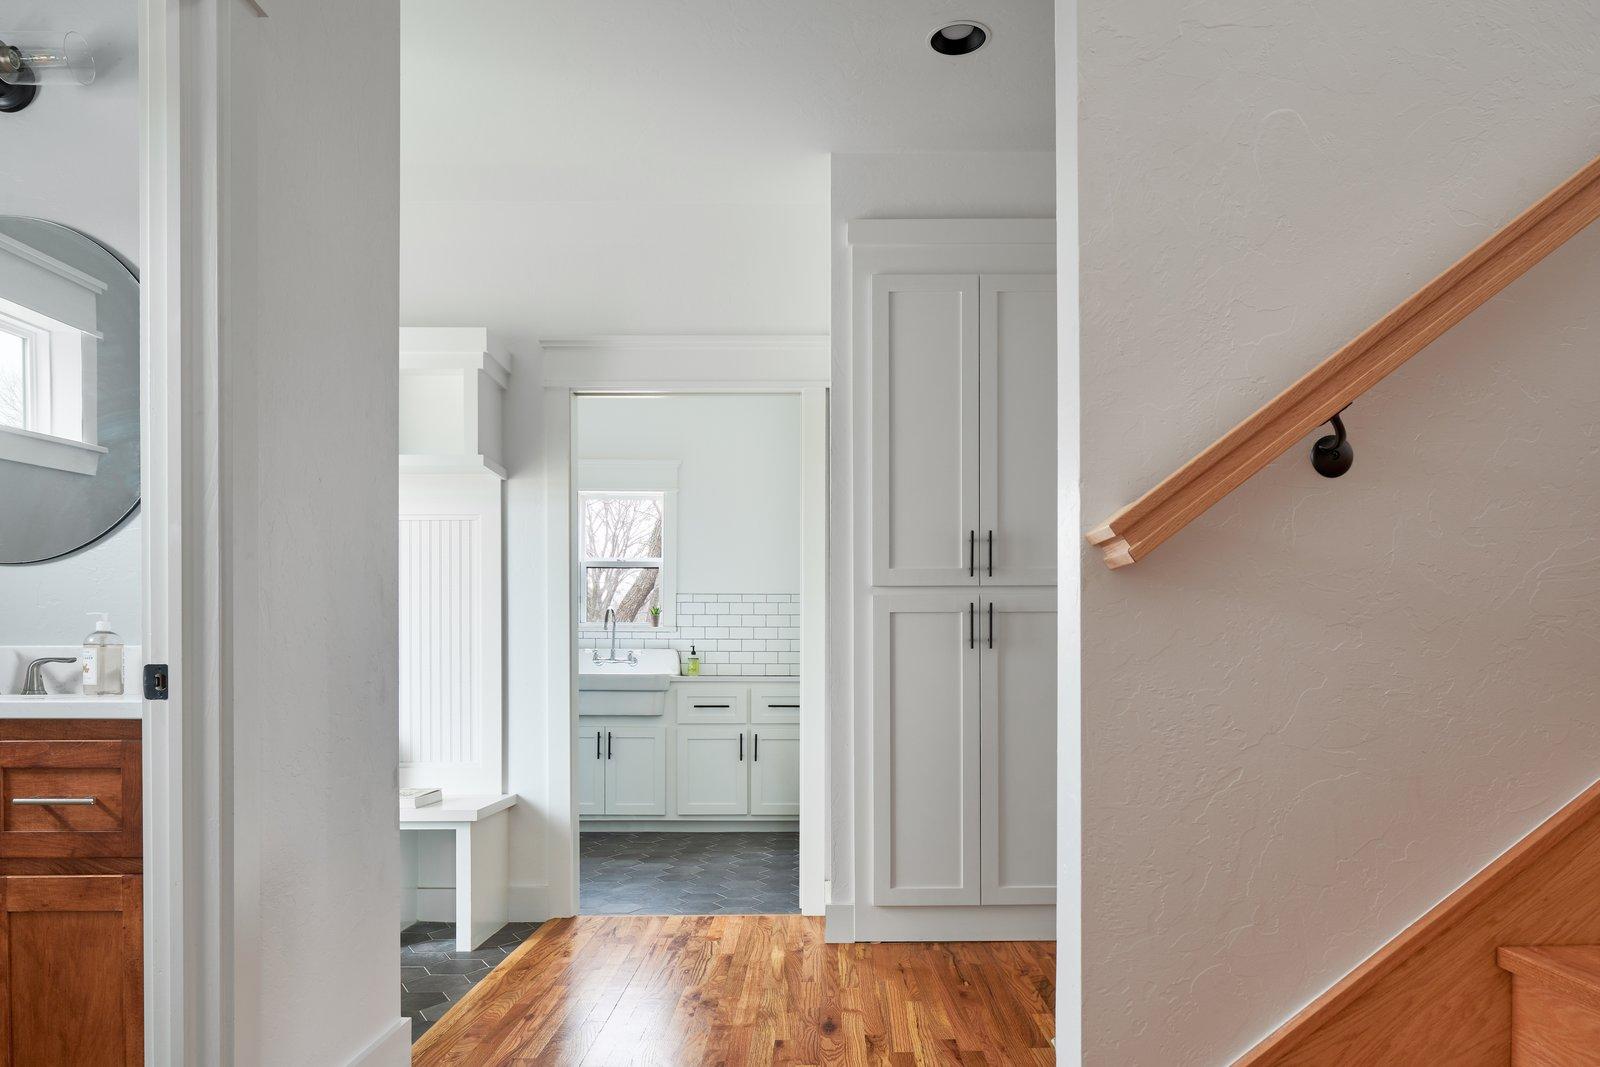 Hallway and Medium Hardwood Floor Hallway from Kitchen  OKC Farmhouse by Scharbach Workshop